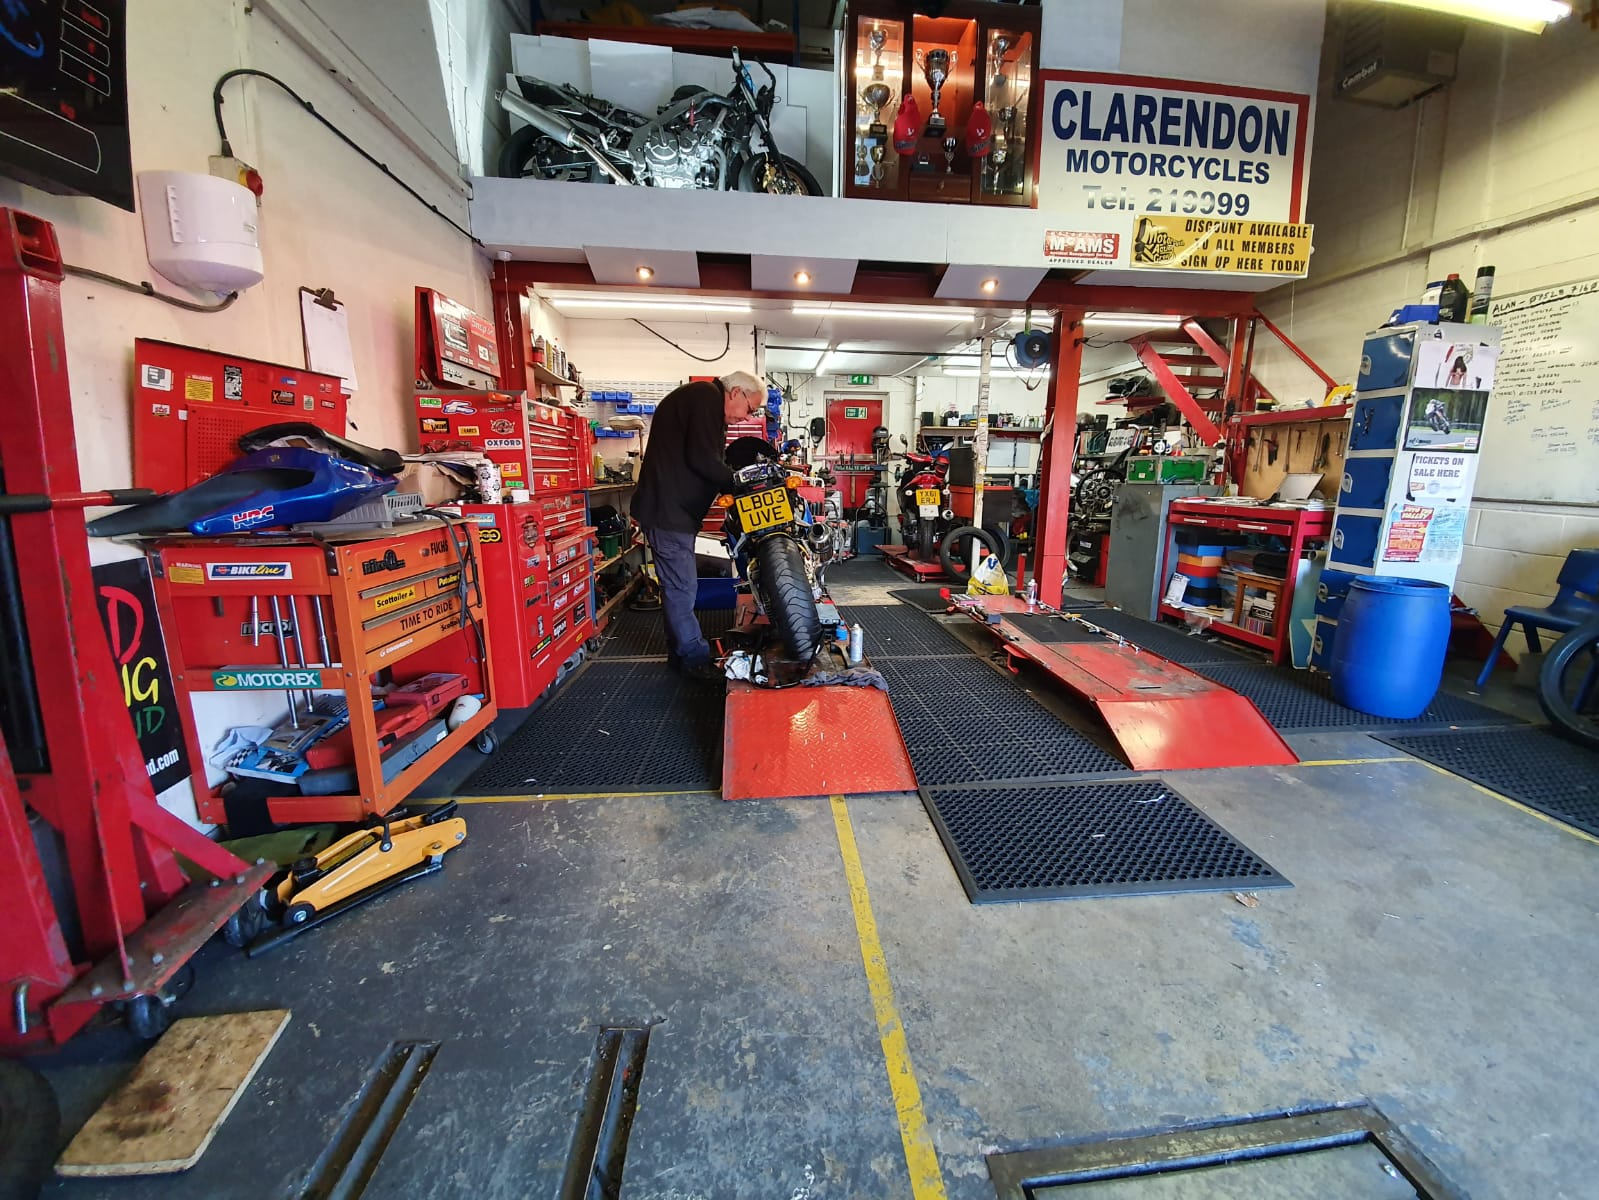 Clarendon motorcycles mechanic